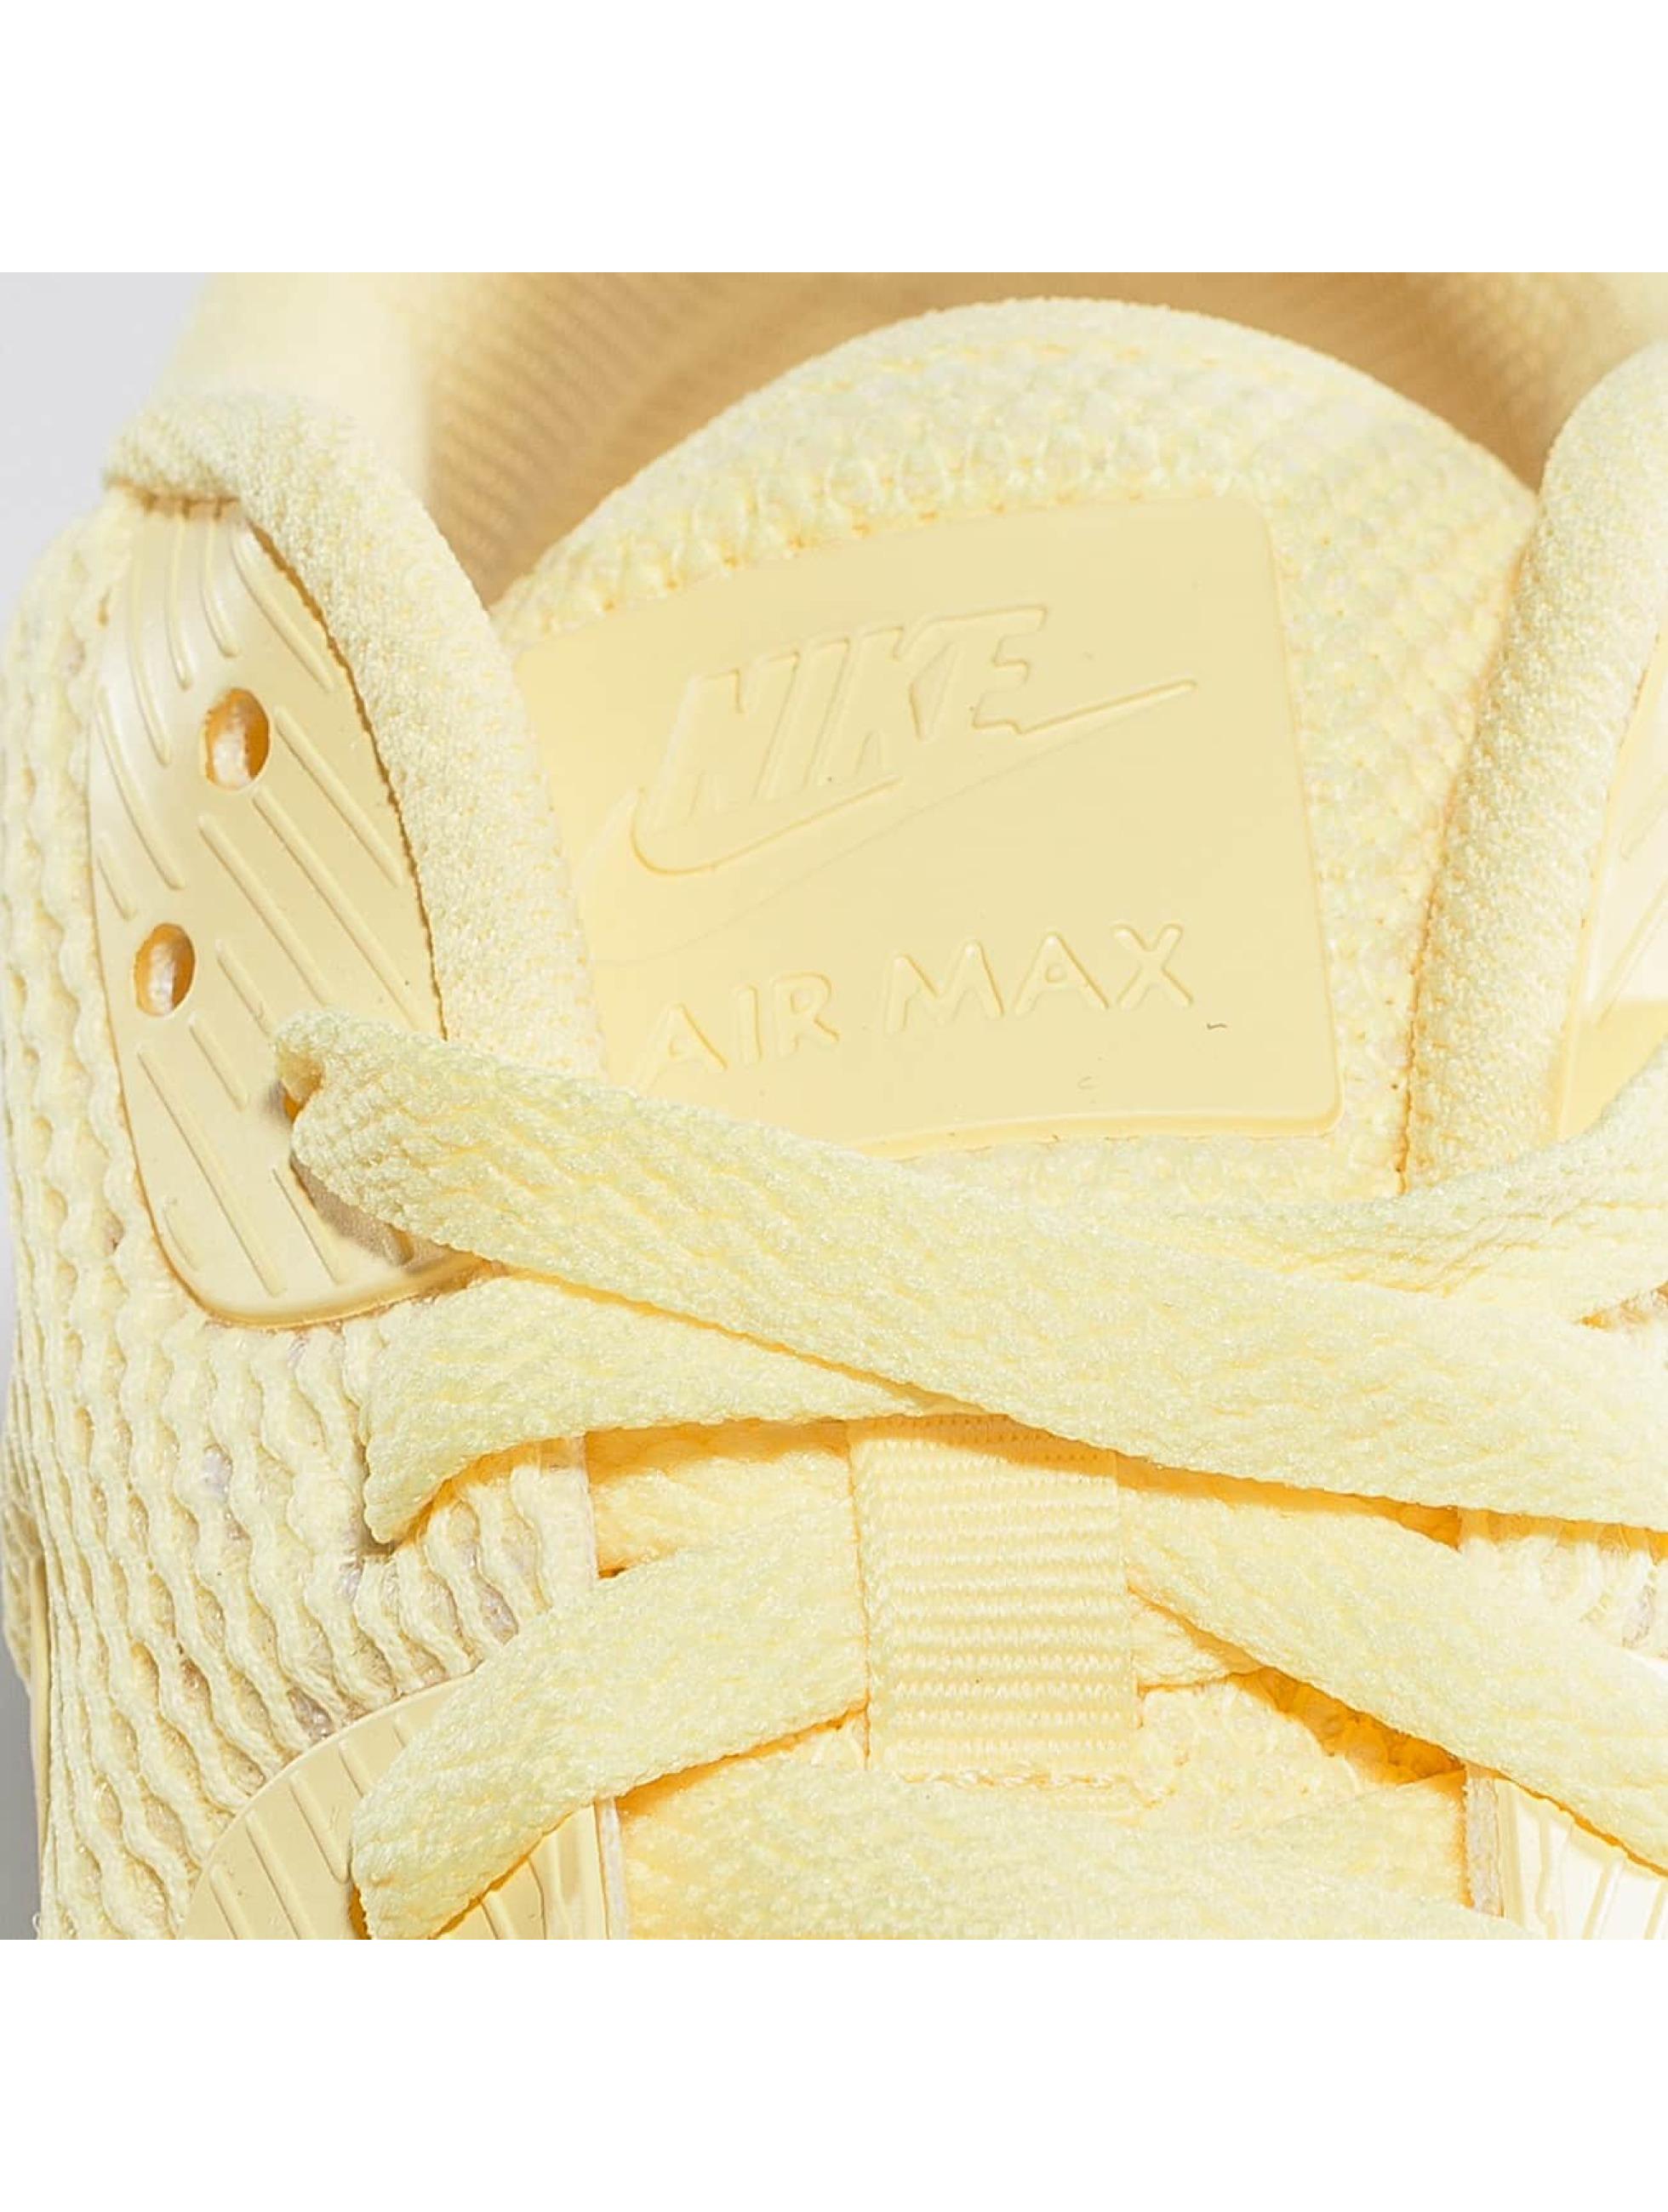 Nike Sneakers Air Max 90 Ultra 2.0 BR yellow